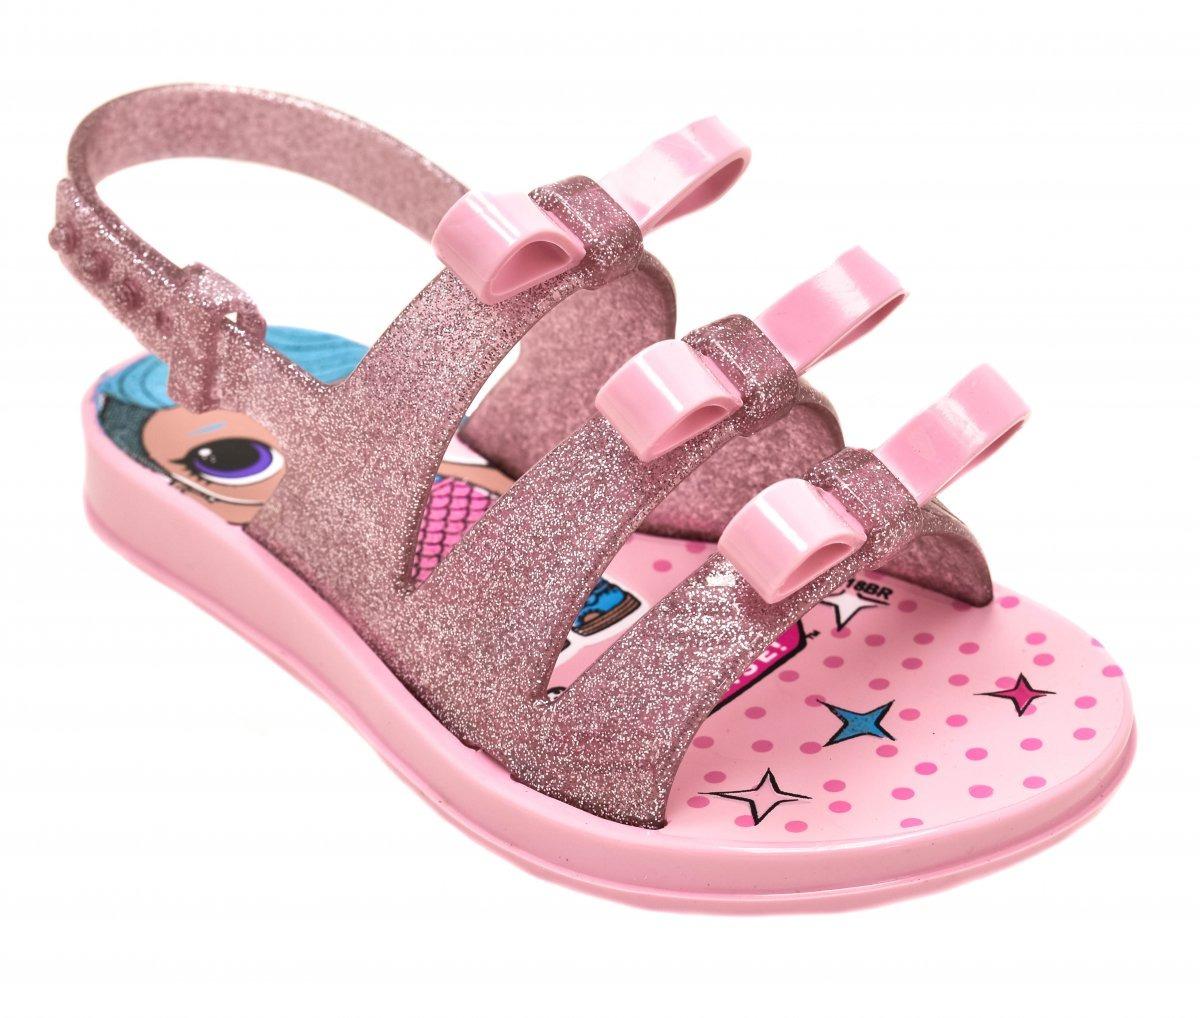 f3e4d322bb sandália infantil menina l.o.l bag. 21836 rosa com laços. Carregando zoom.